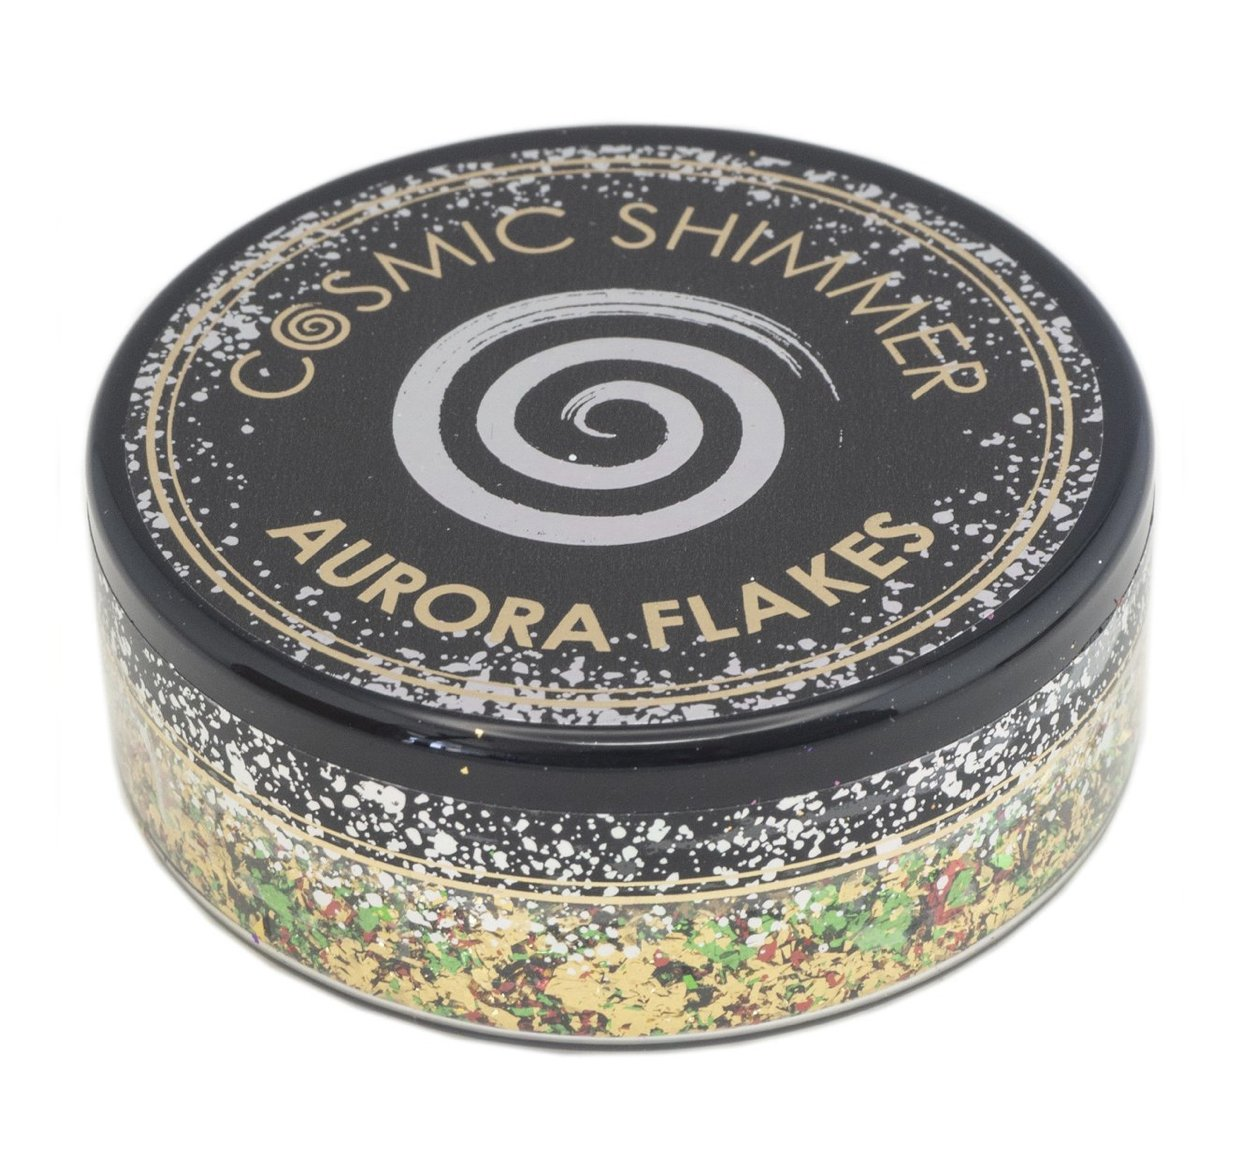 Aurora Flakes- Festive Jewel